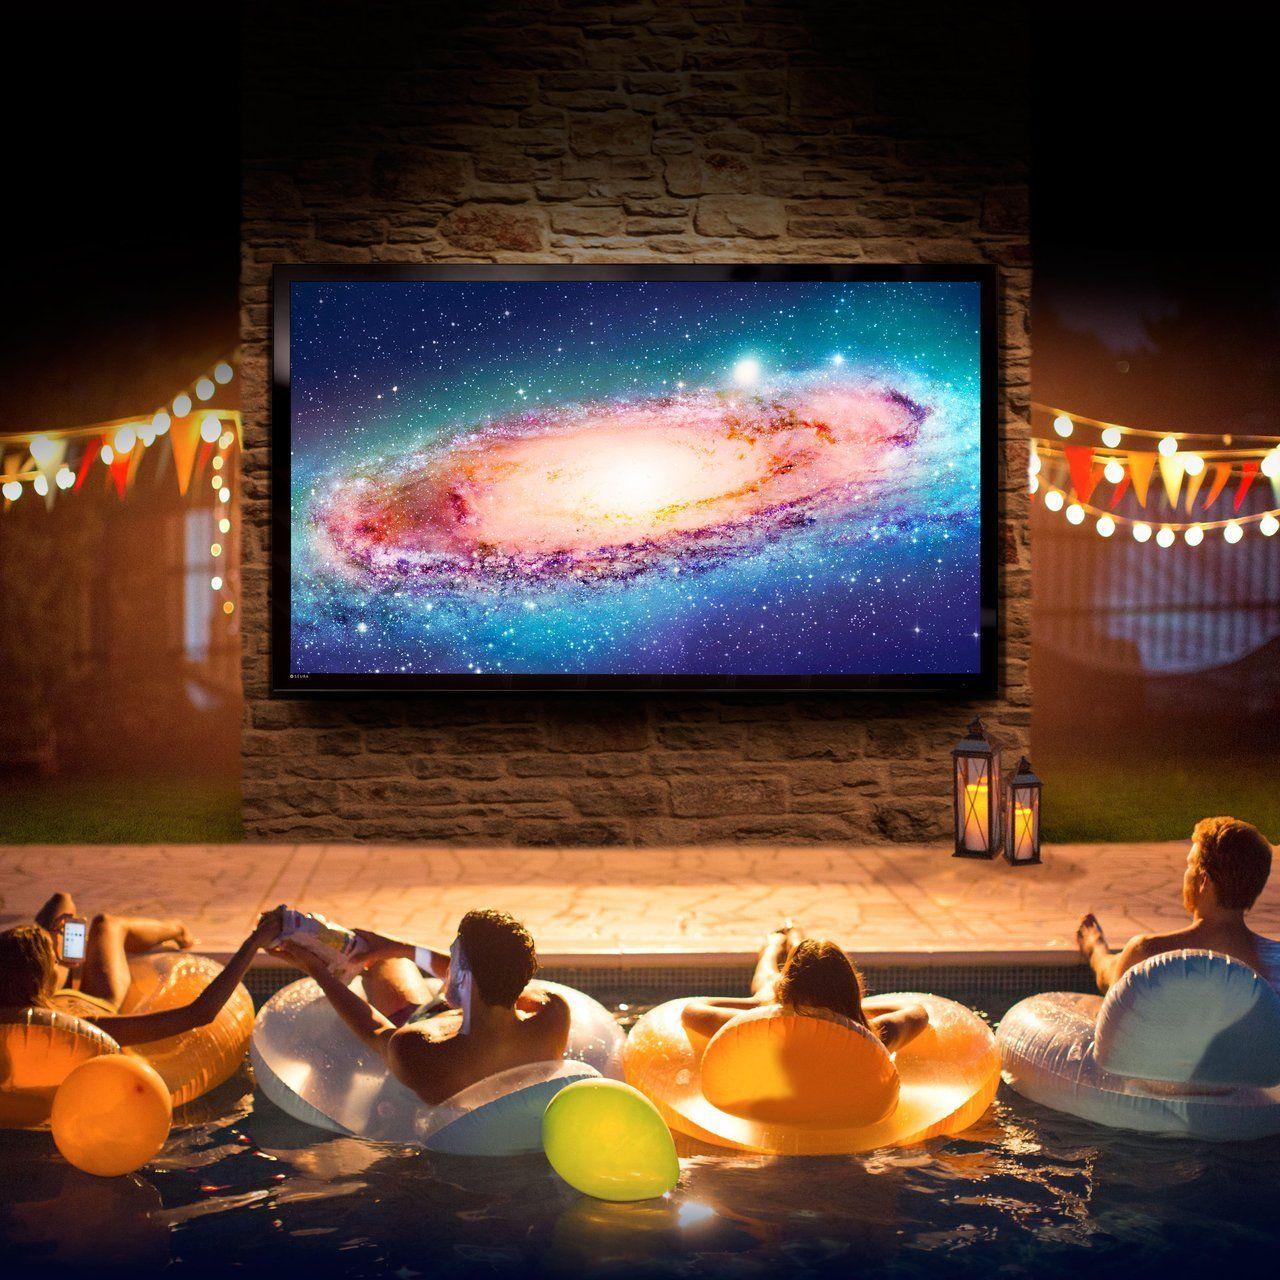 "Seura 84"" Storm Ultra Bright Black Outdoor UHD 4K TV set up jus like this be badass"